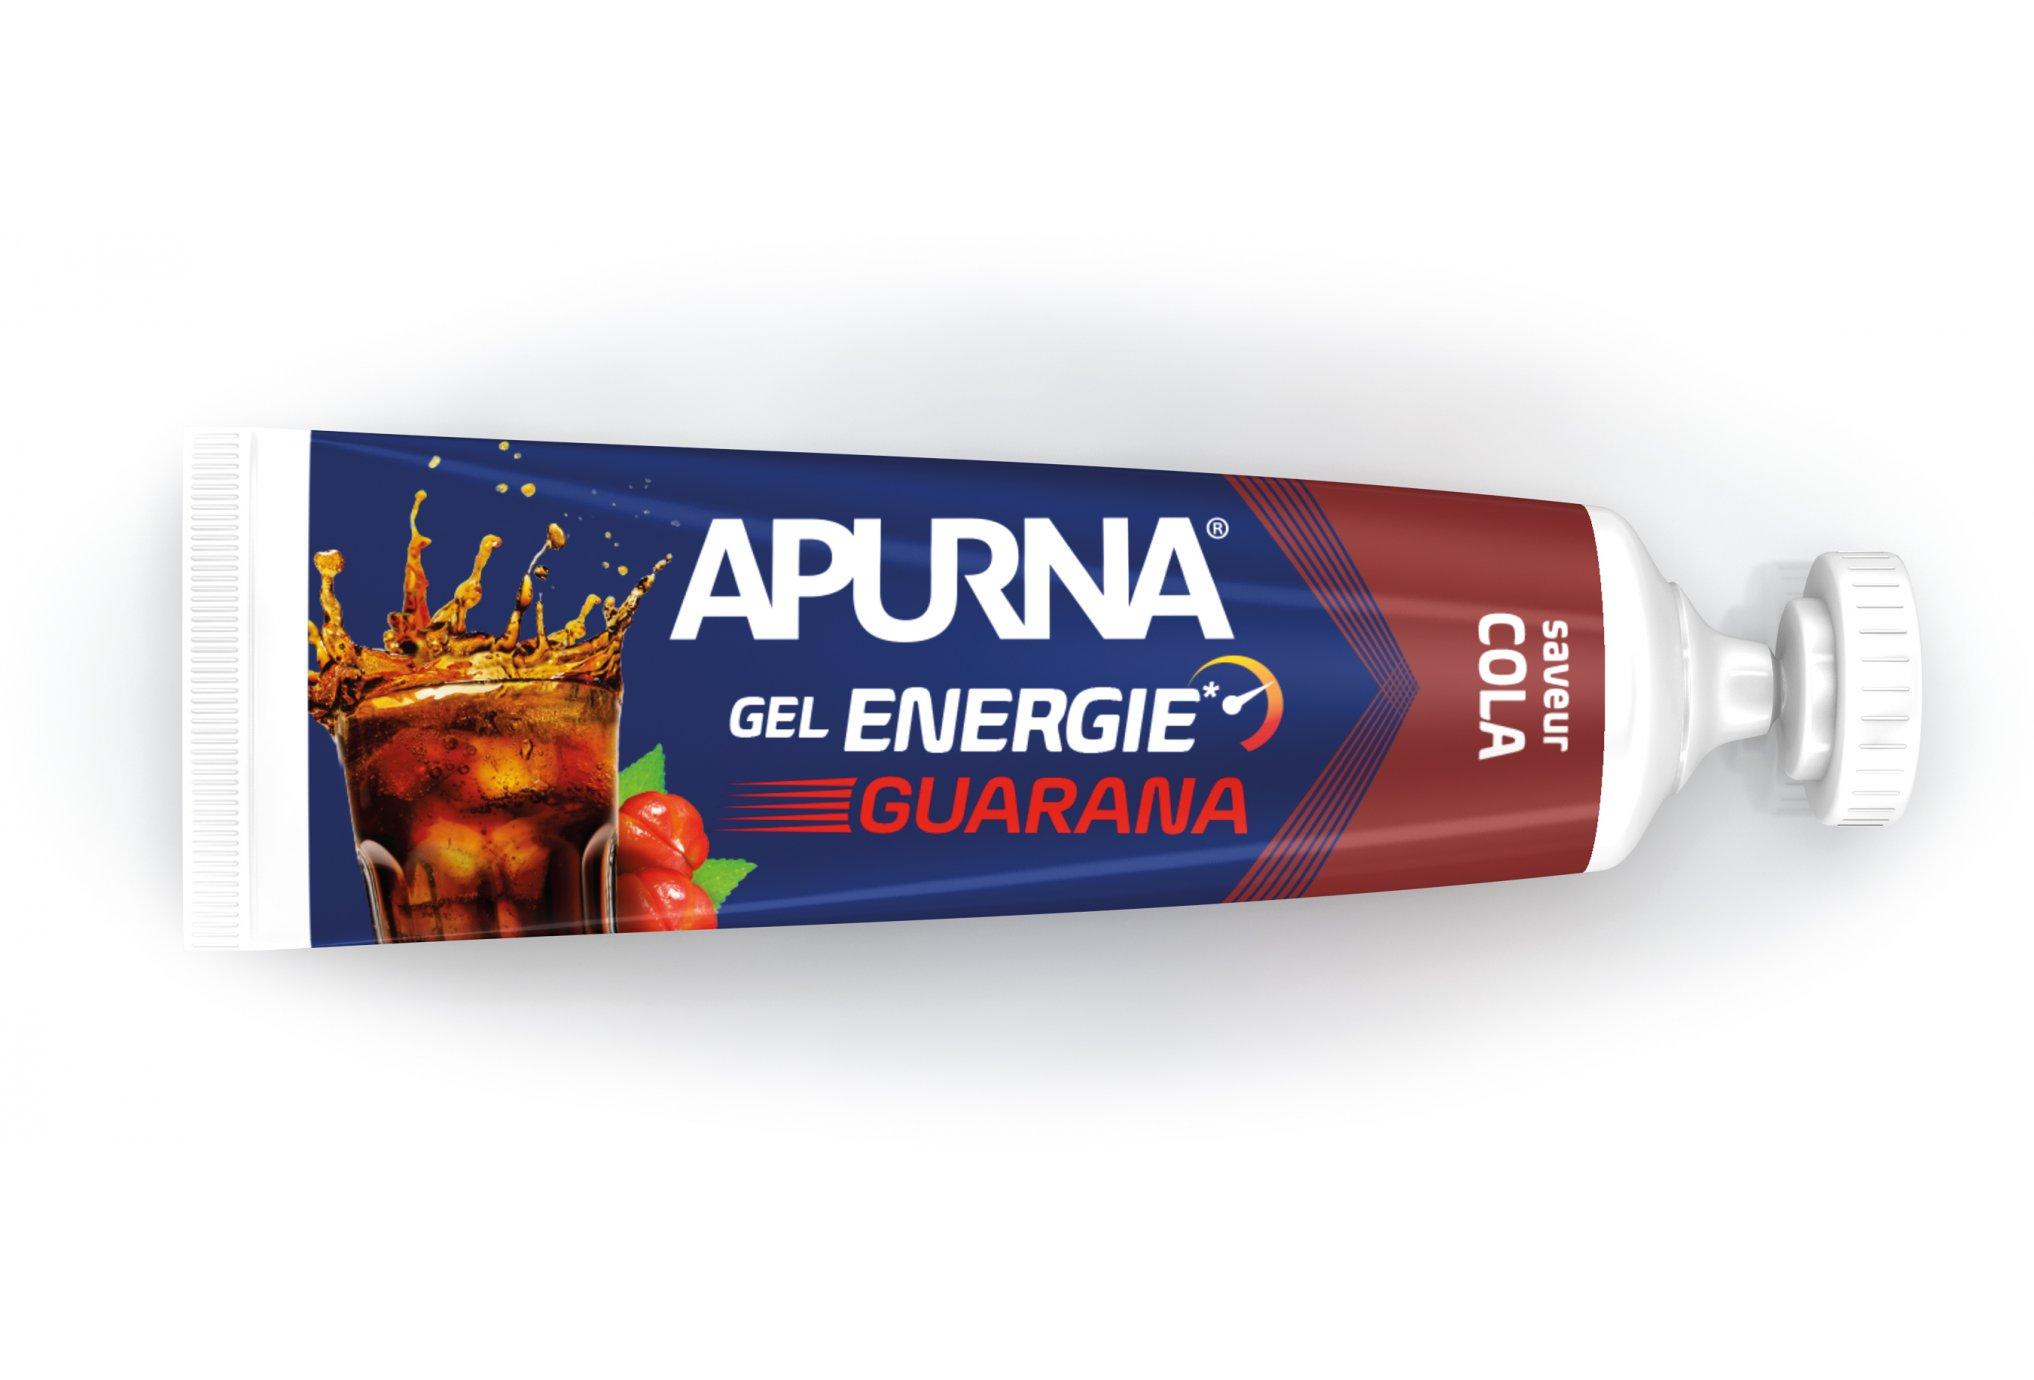 Apurna Gel energie guarana - cola diététique gels